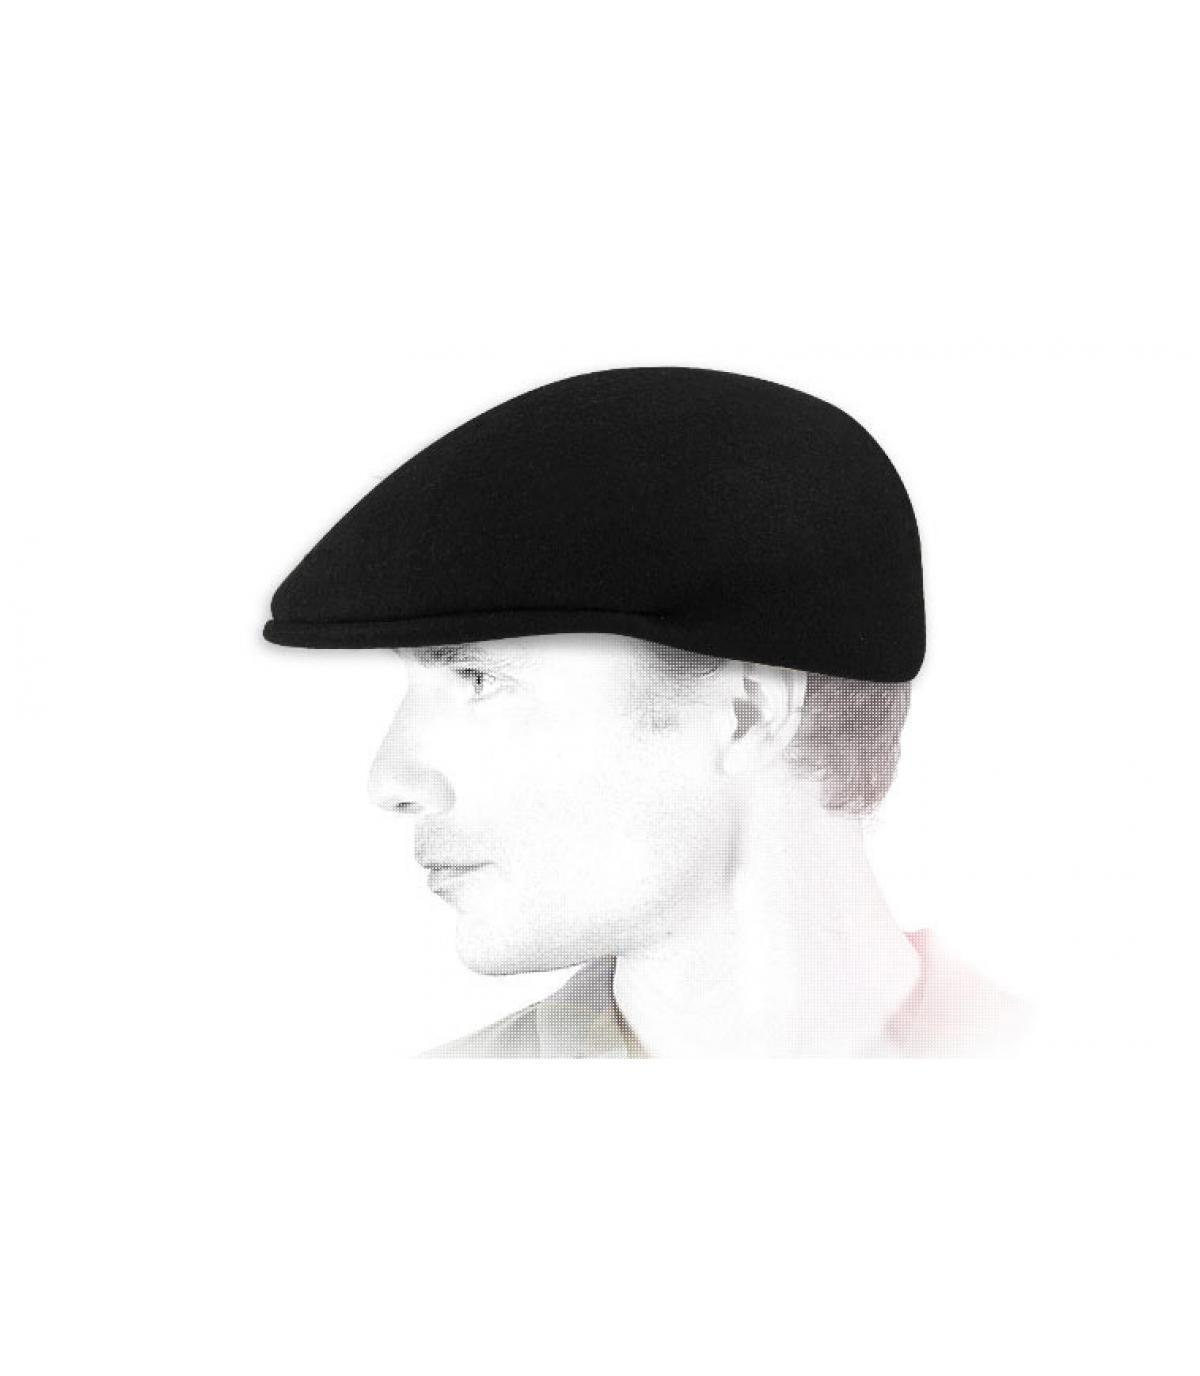 Visor felt ivy cap